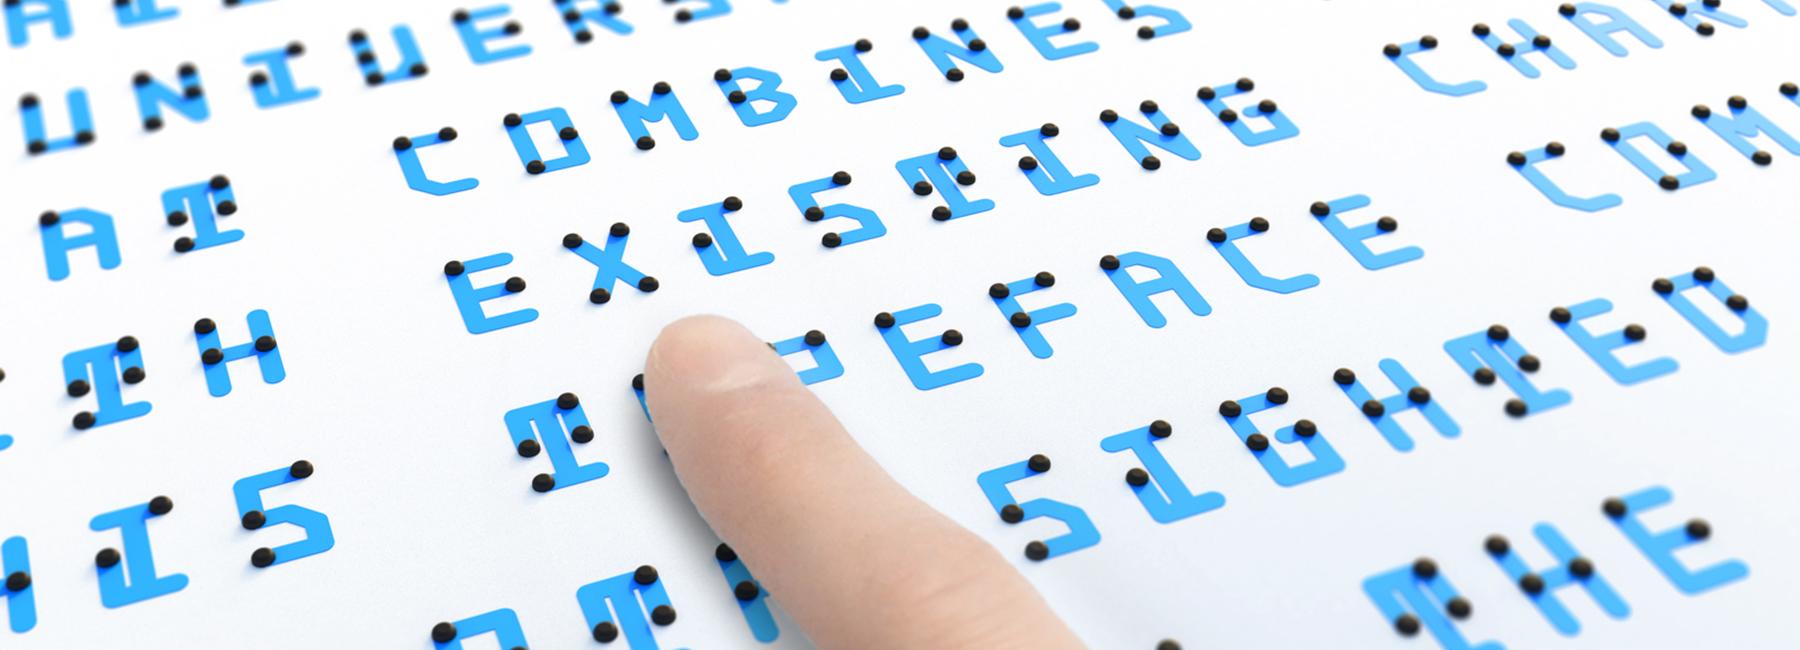 braille-neue-kosuke-takahashi-noko-01.jpg